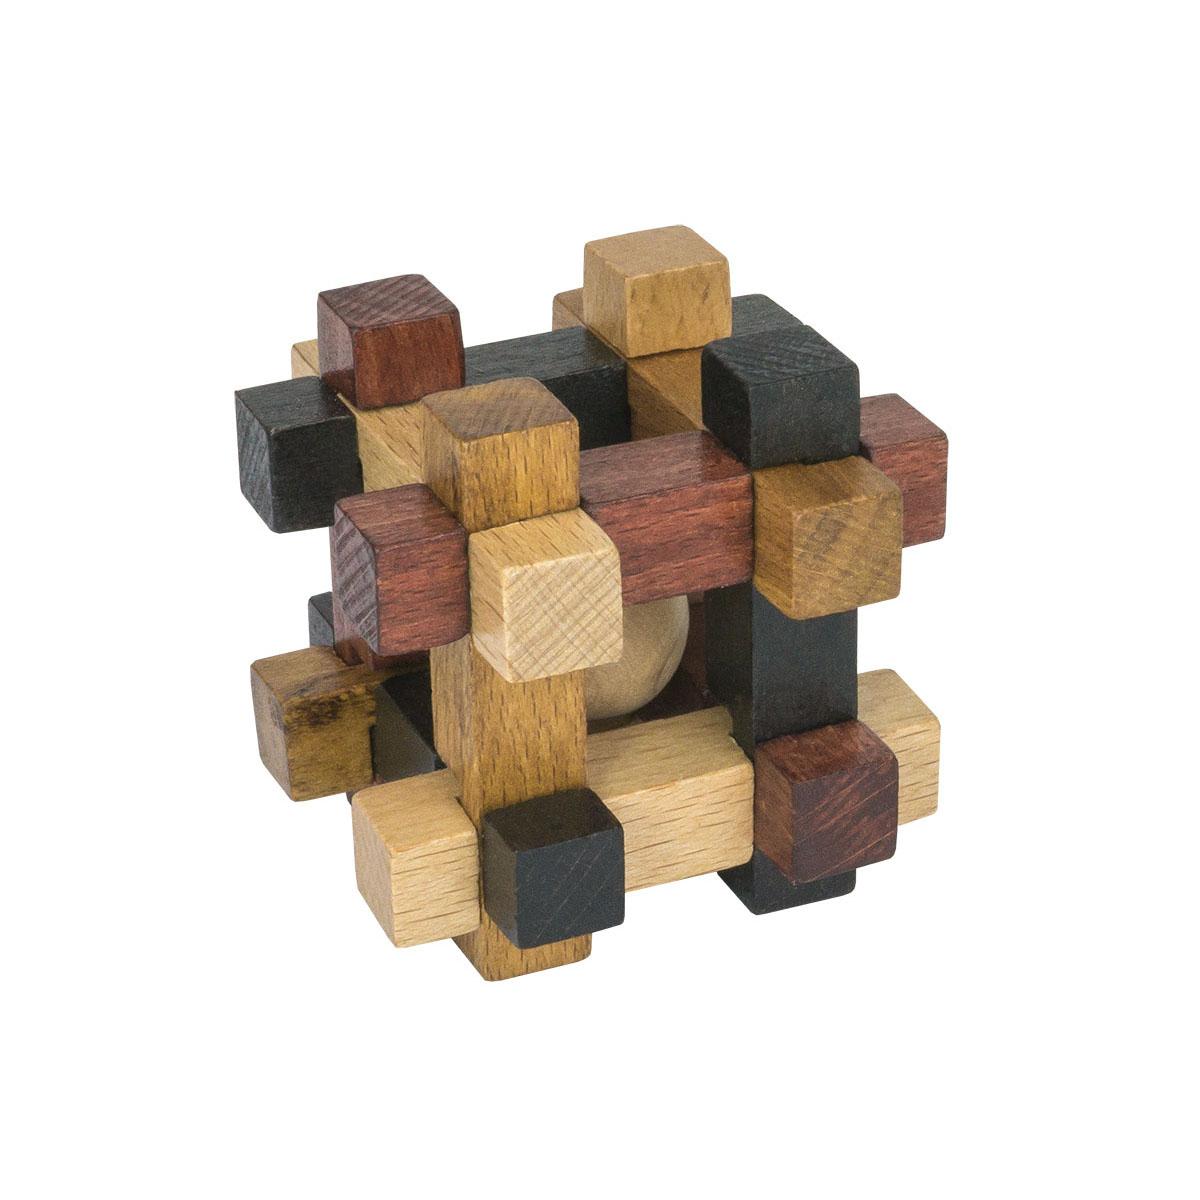 PuzzleAcademyNEW (5 of 7)